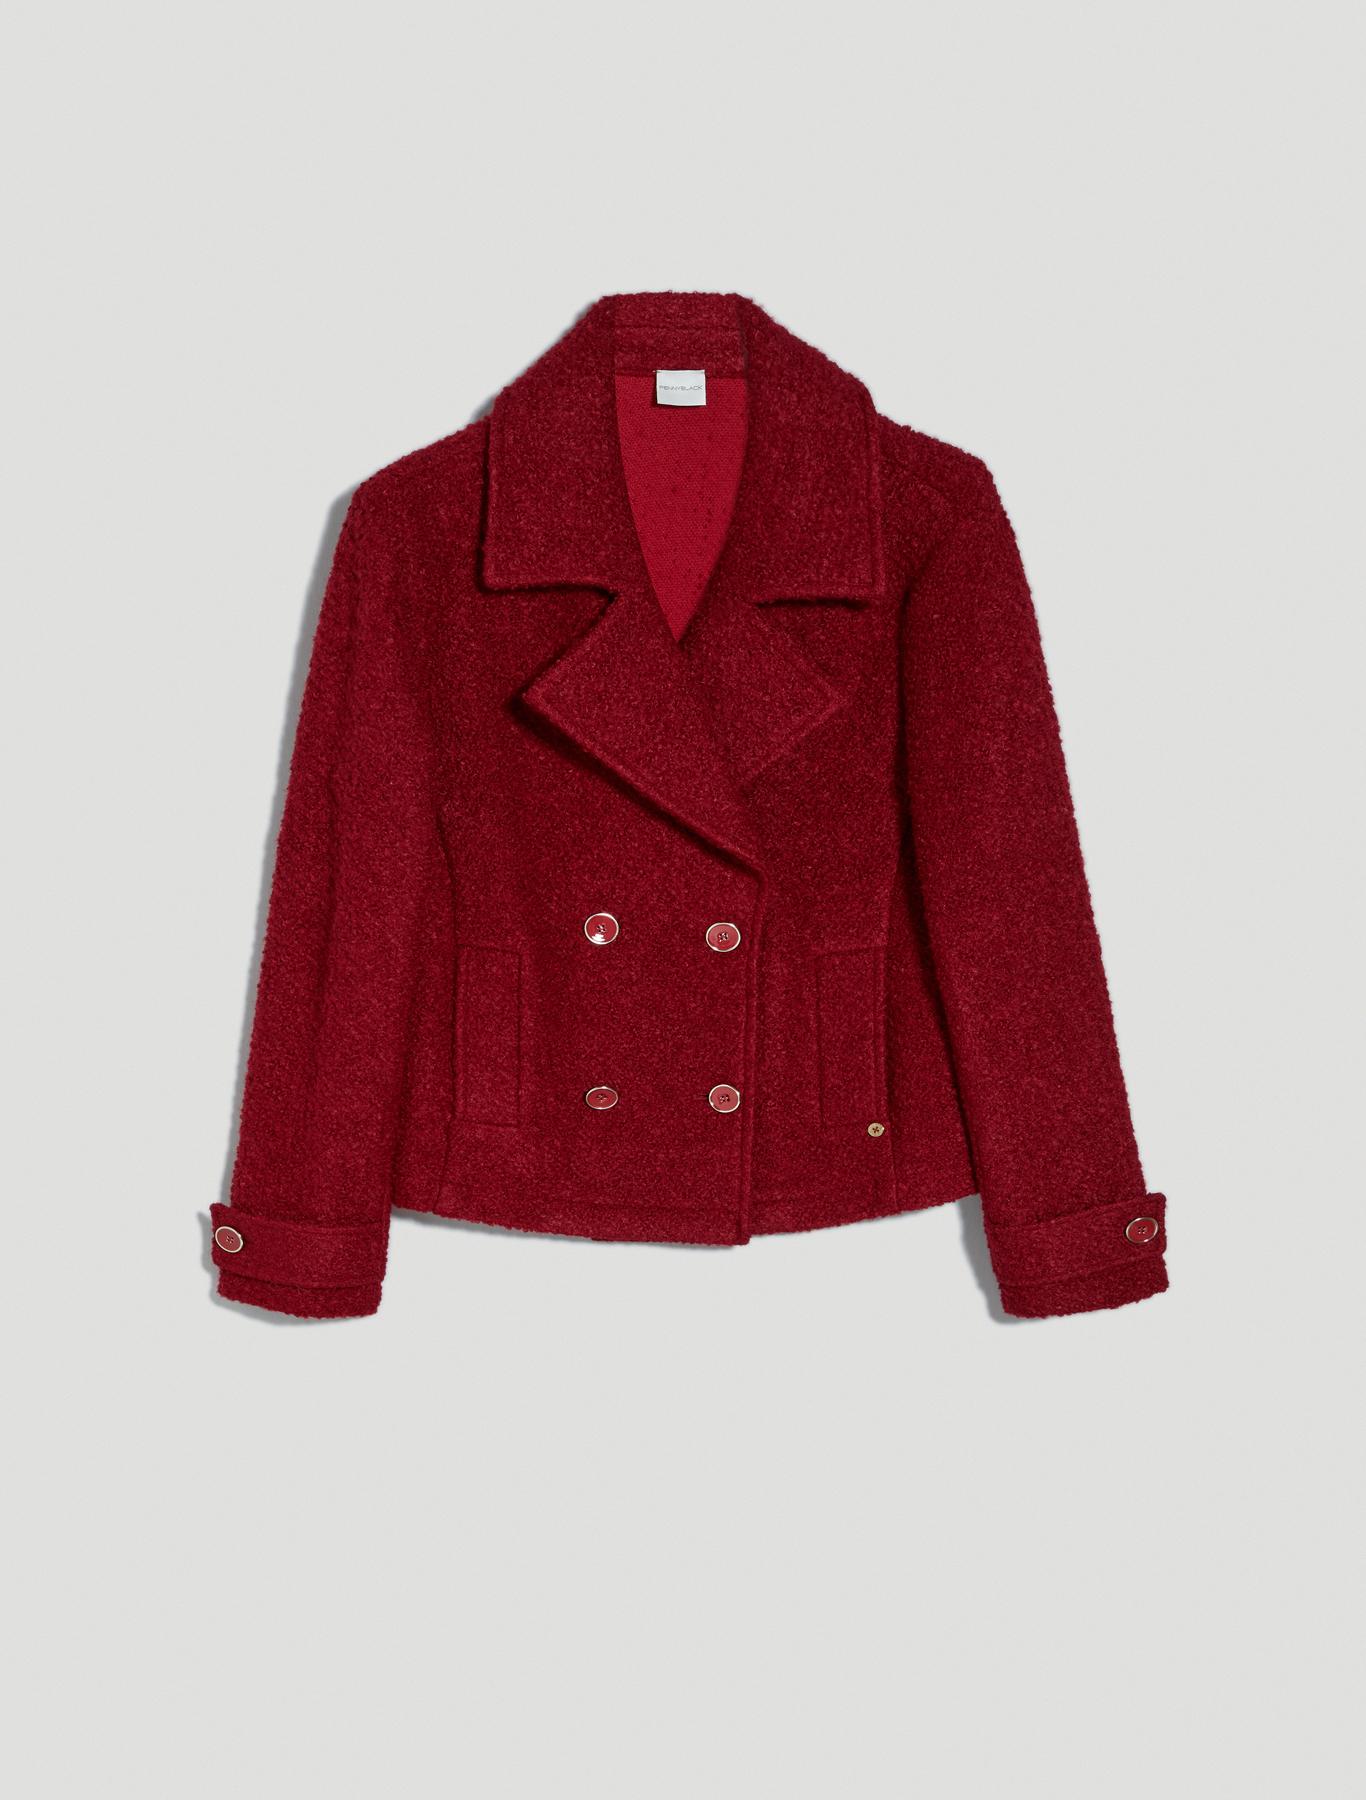 Pea coat in bouclé jersey - red - pennyblack